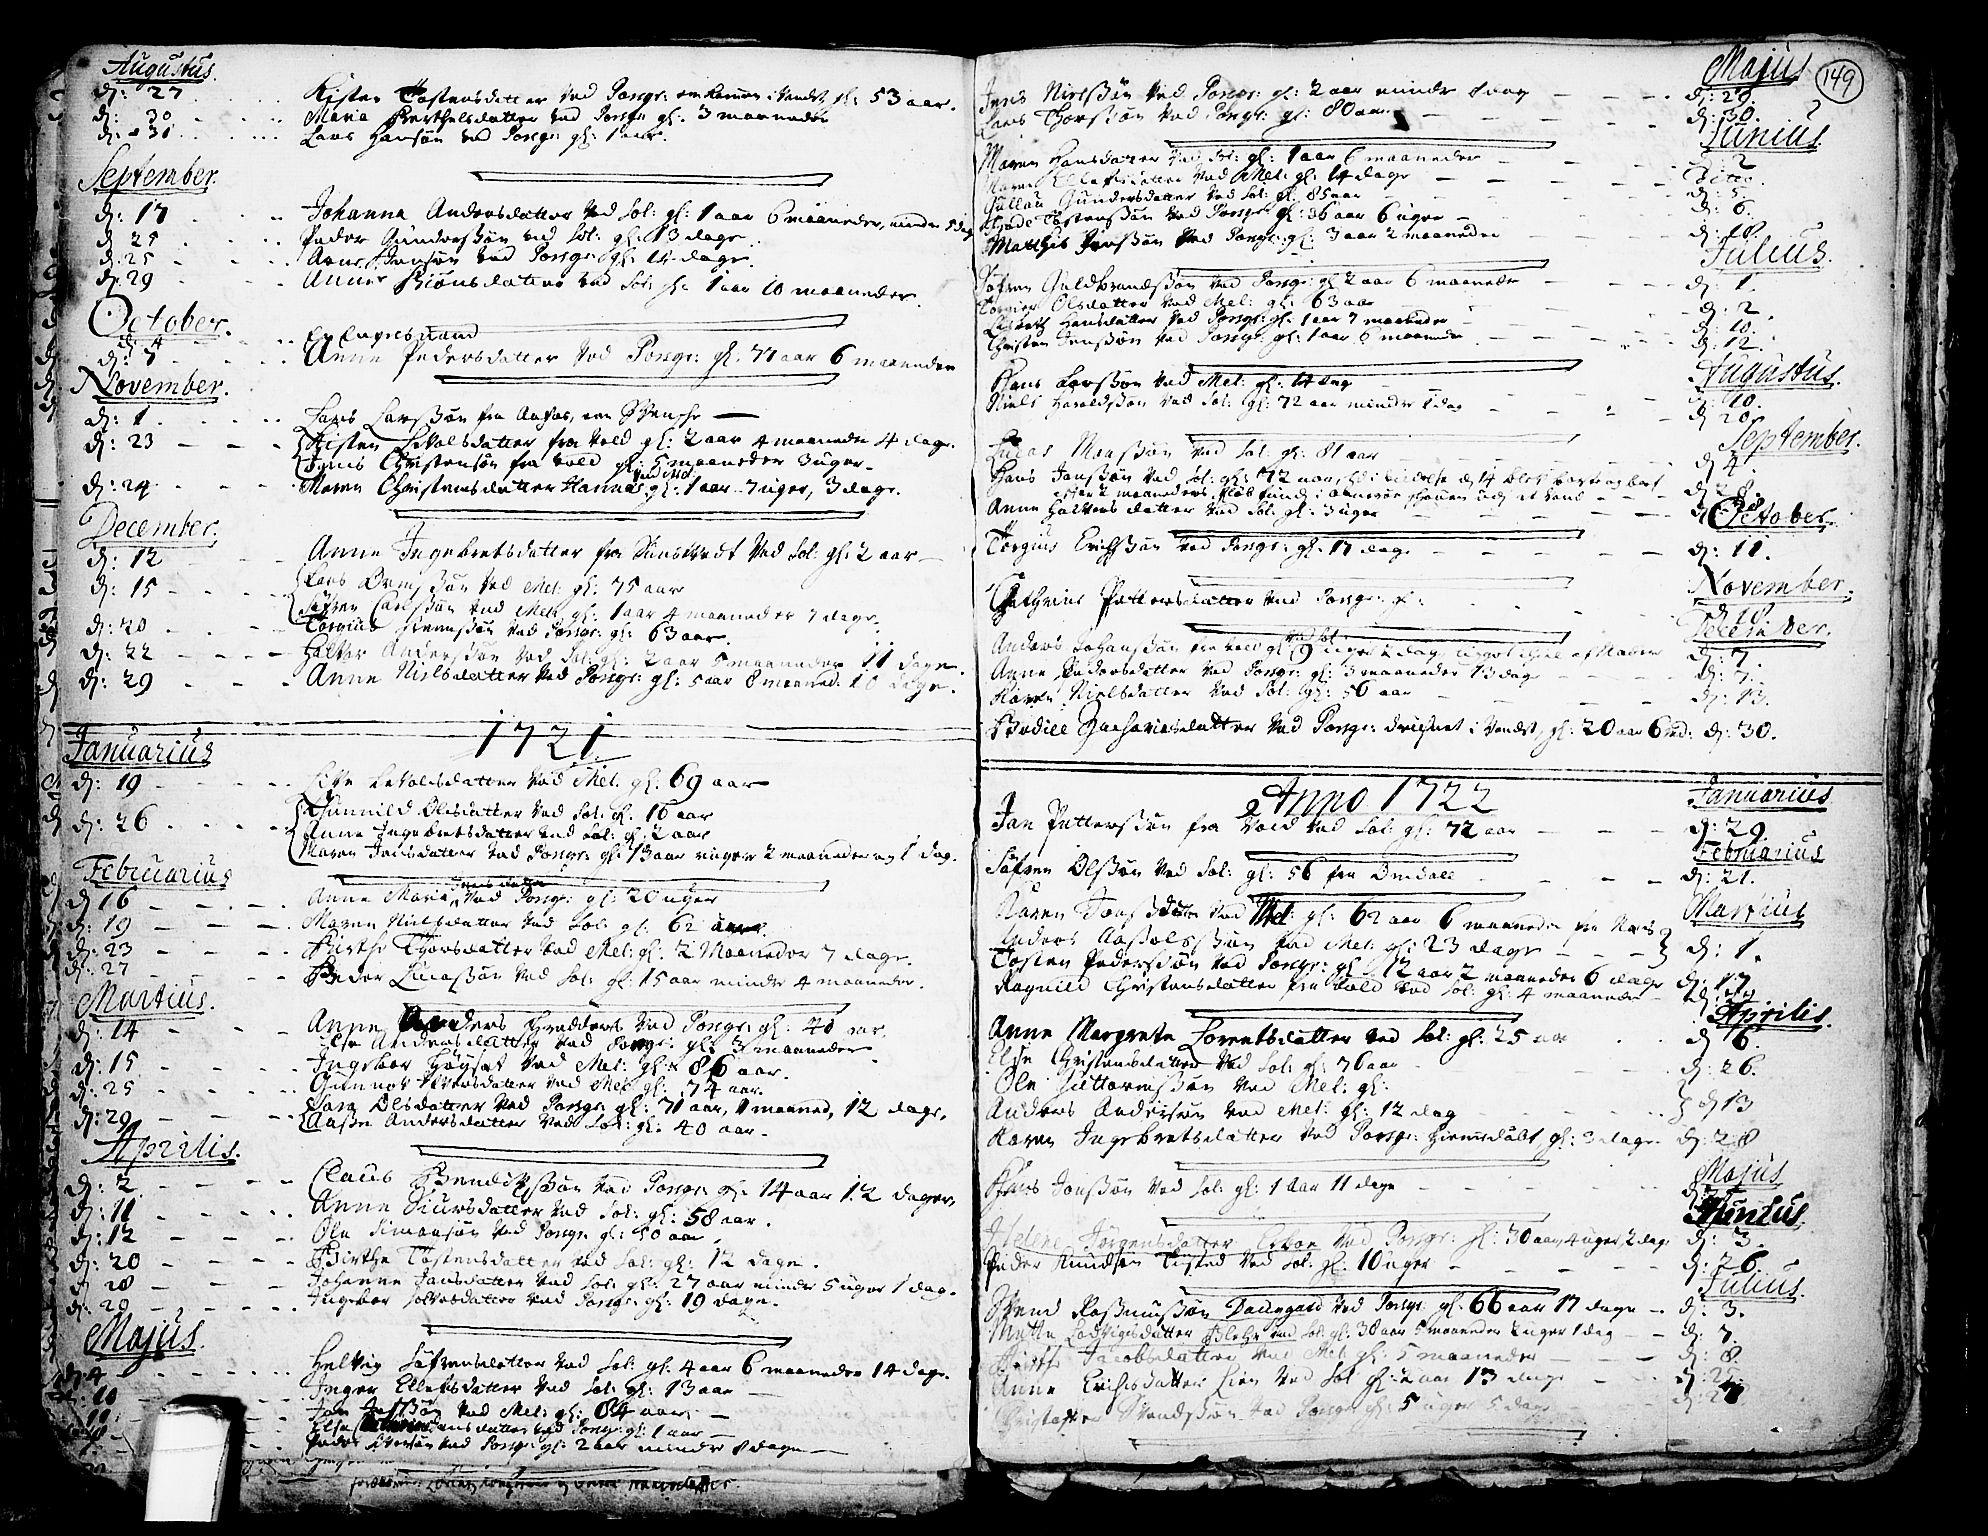 SAKO, Solum kirkebøker, F/Fa/L0002: Ministerialbok nr. I 2, 1713-1761, s. 149